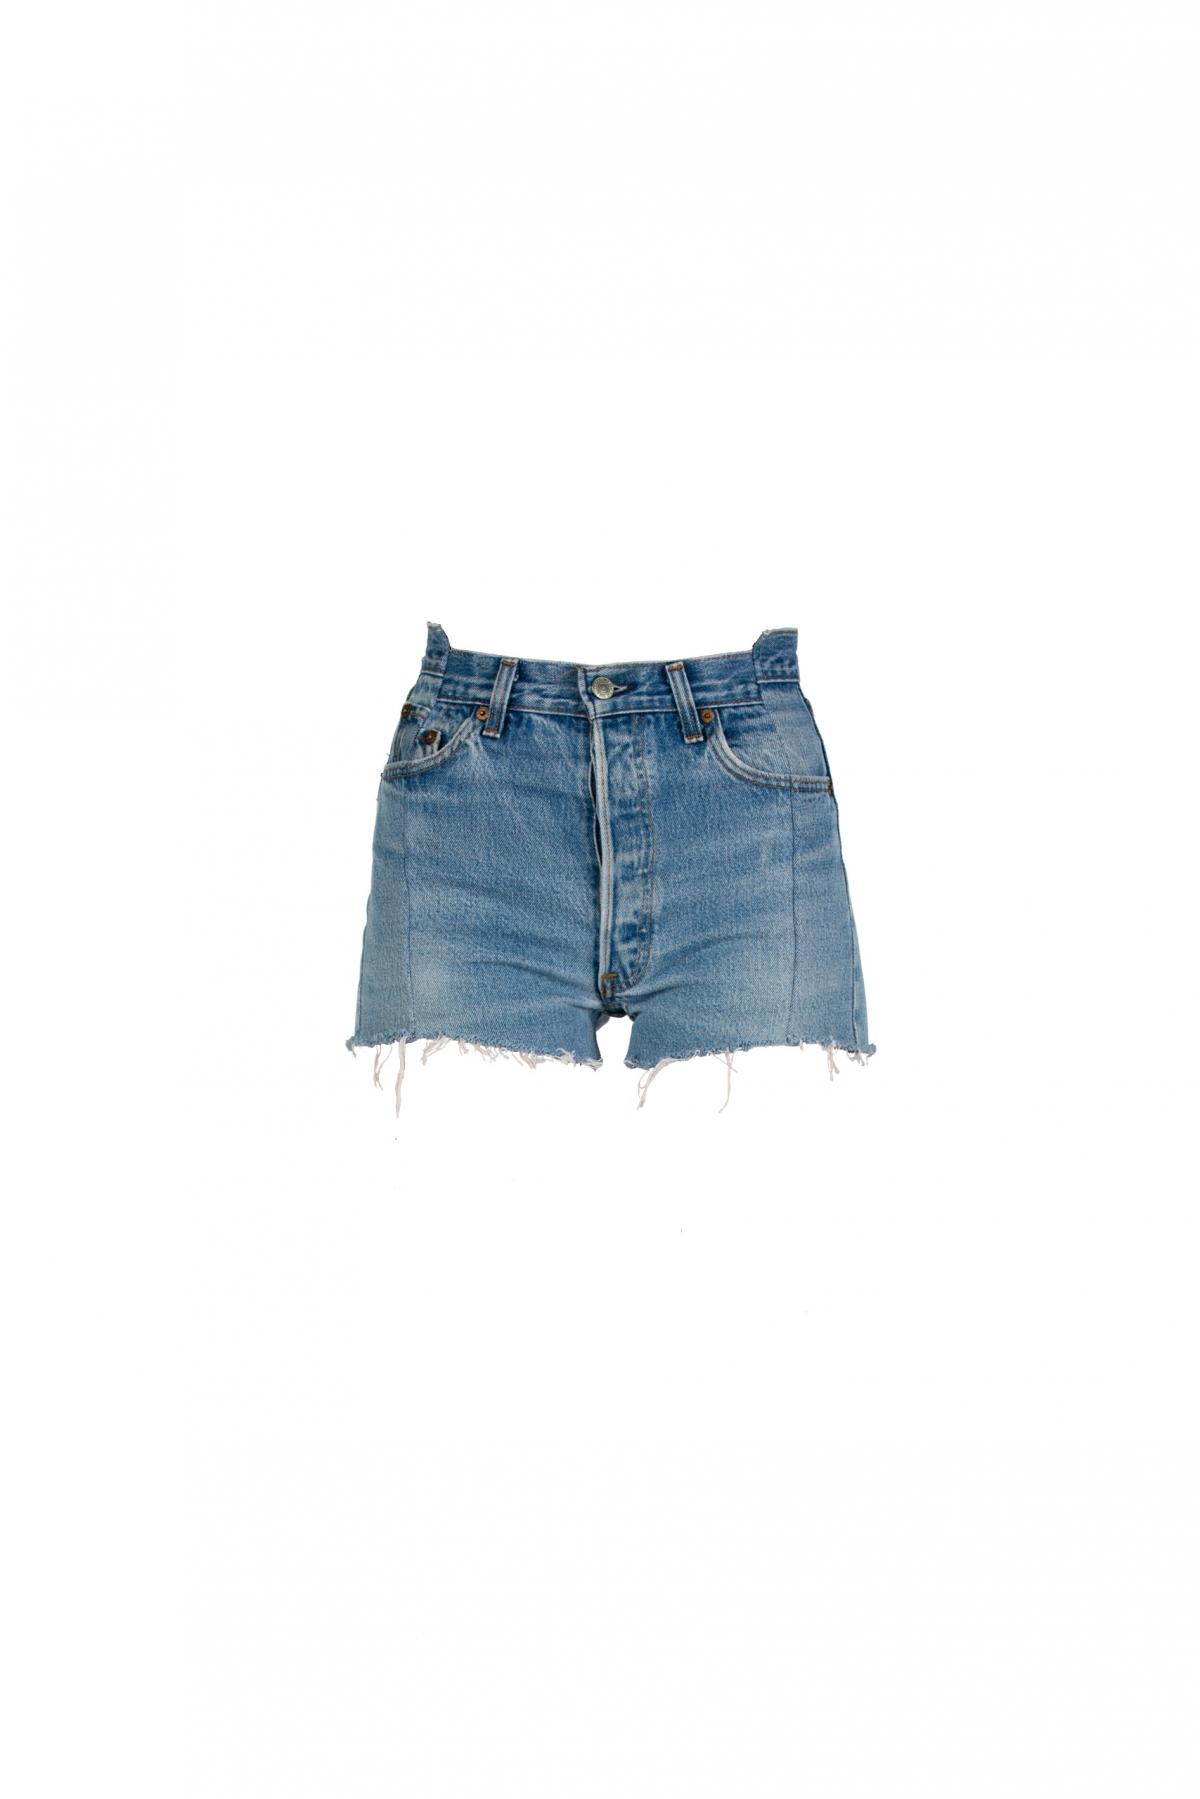 OG Shorts by EB Denim, available on ebdenim.com for $215 Hailey Baldwin Shorts Exact Product